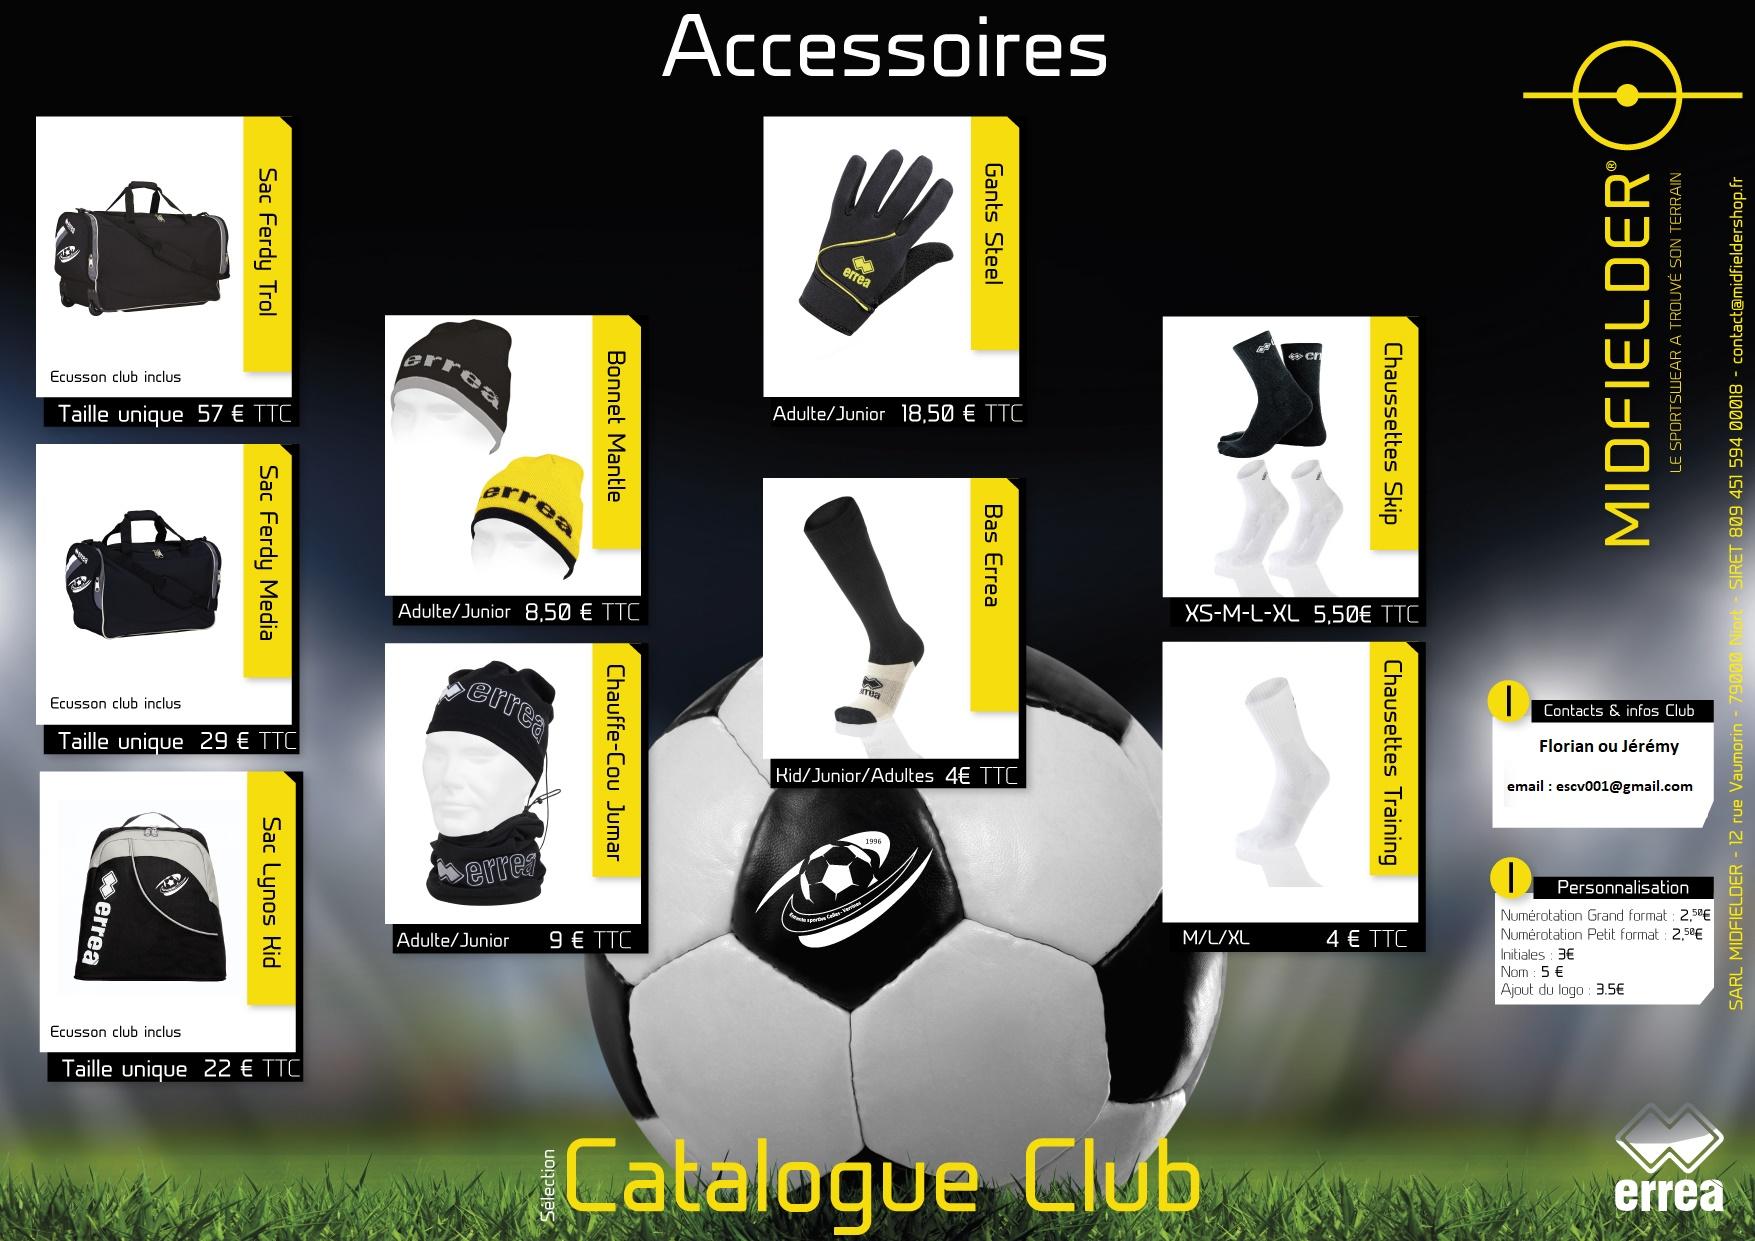 catalogue club17-accessoires-01.jpg